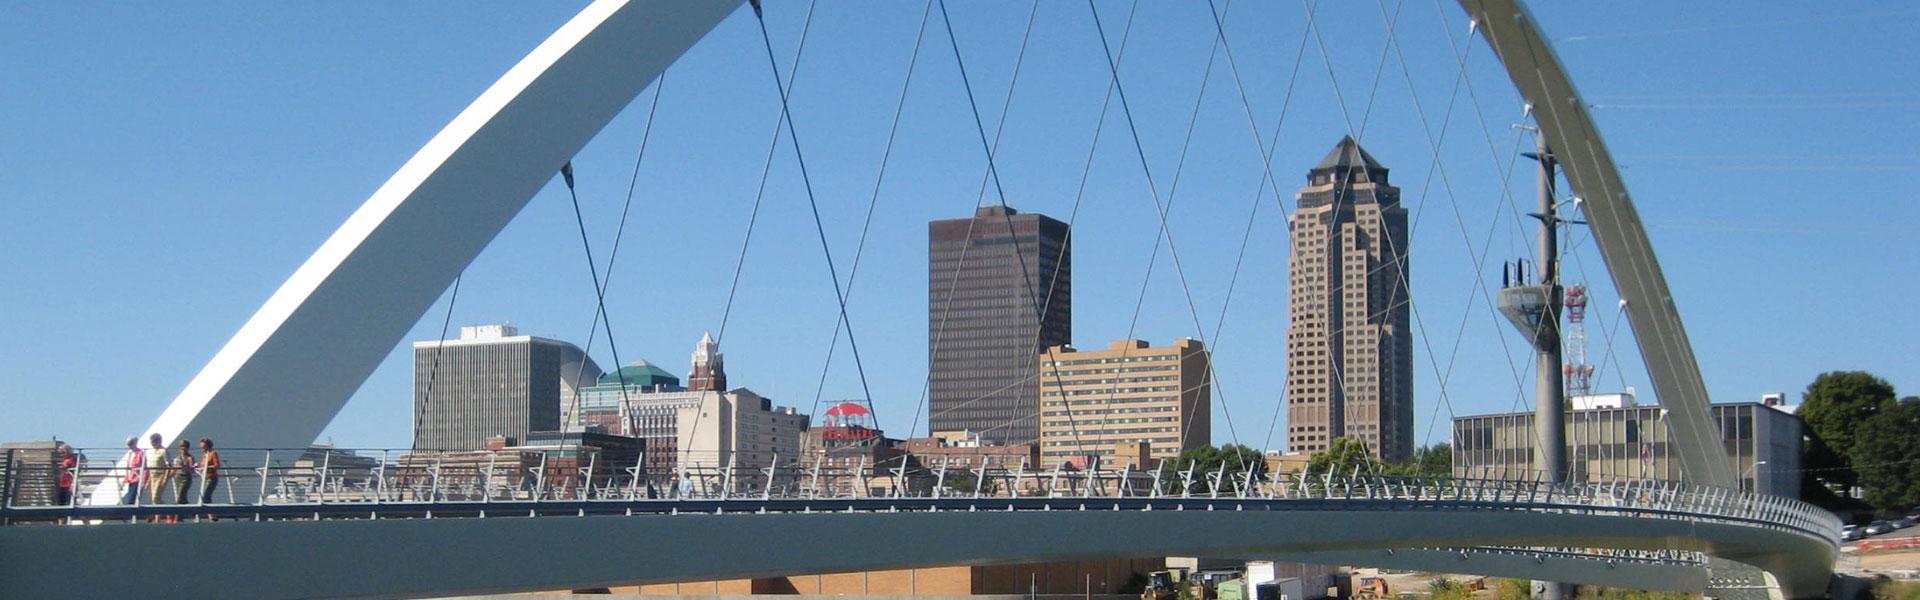 Skyline downtown Des Moines